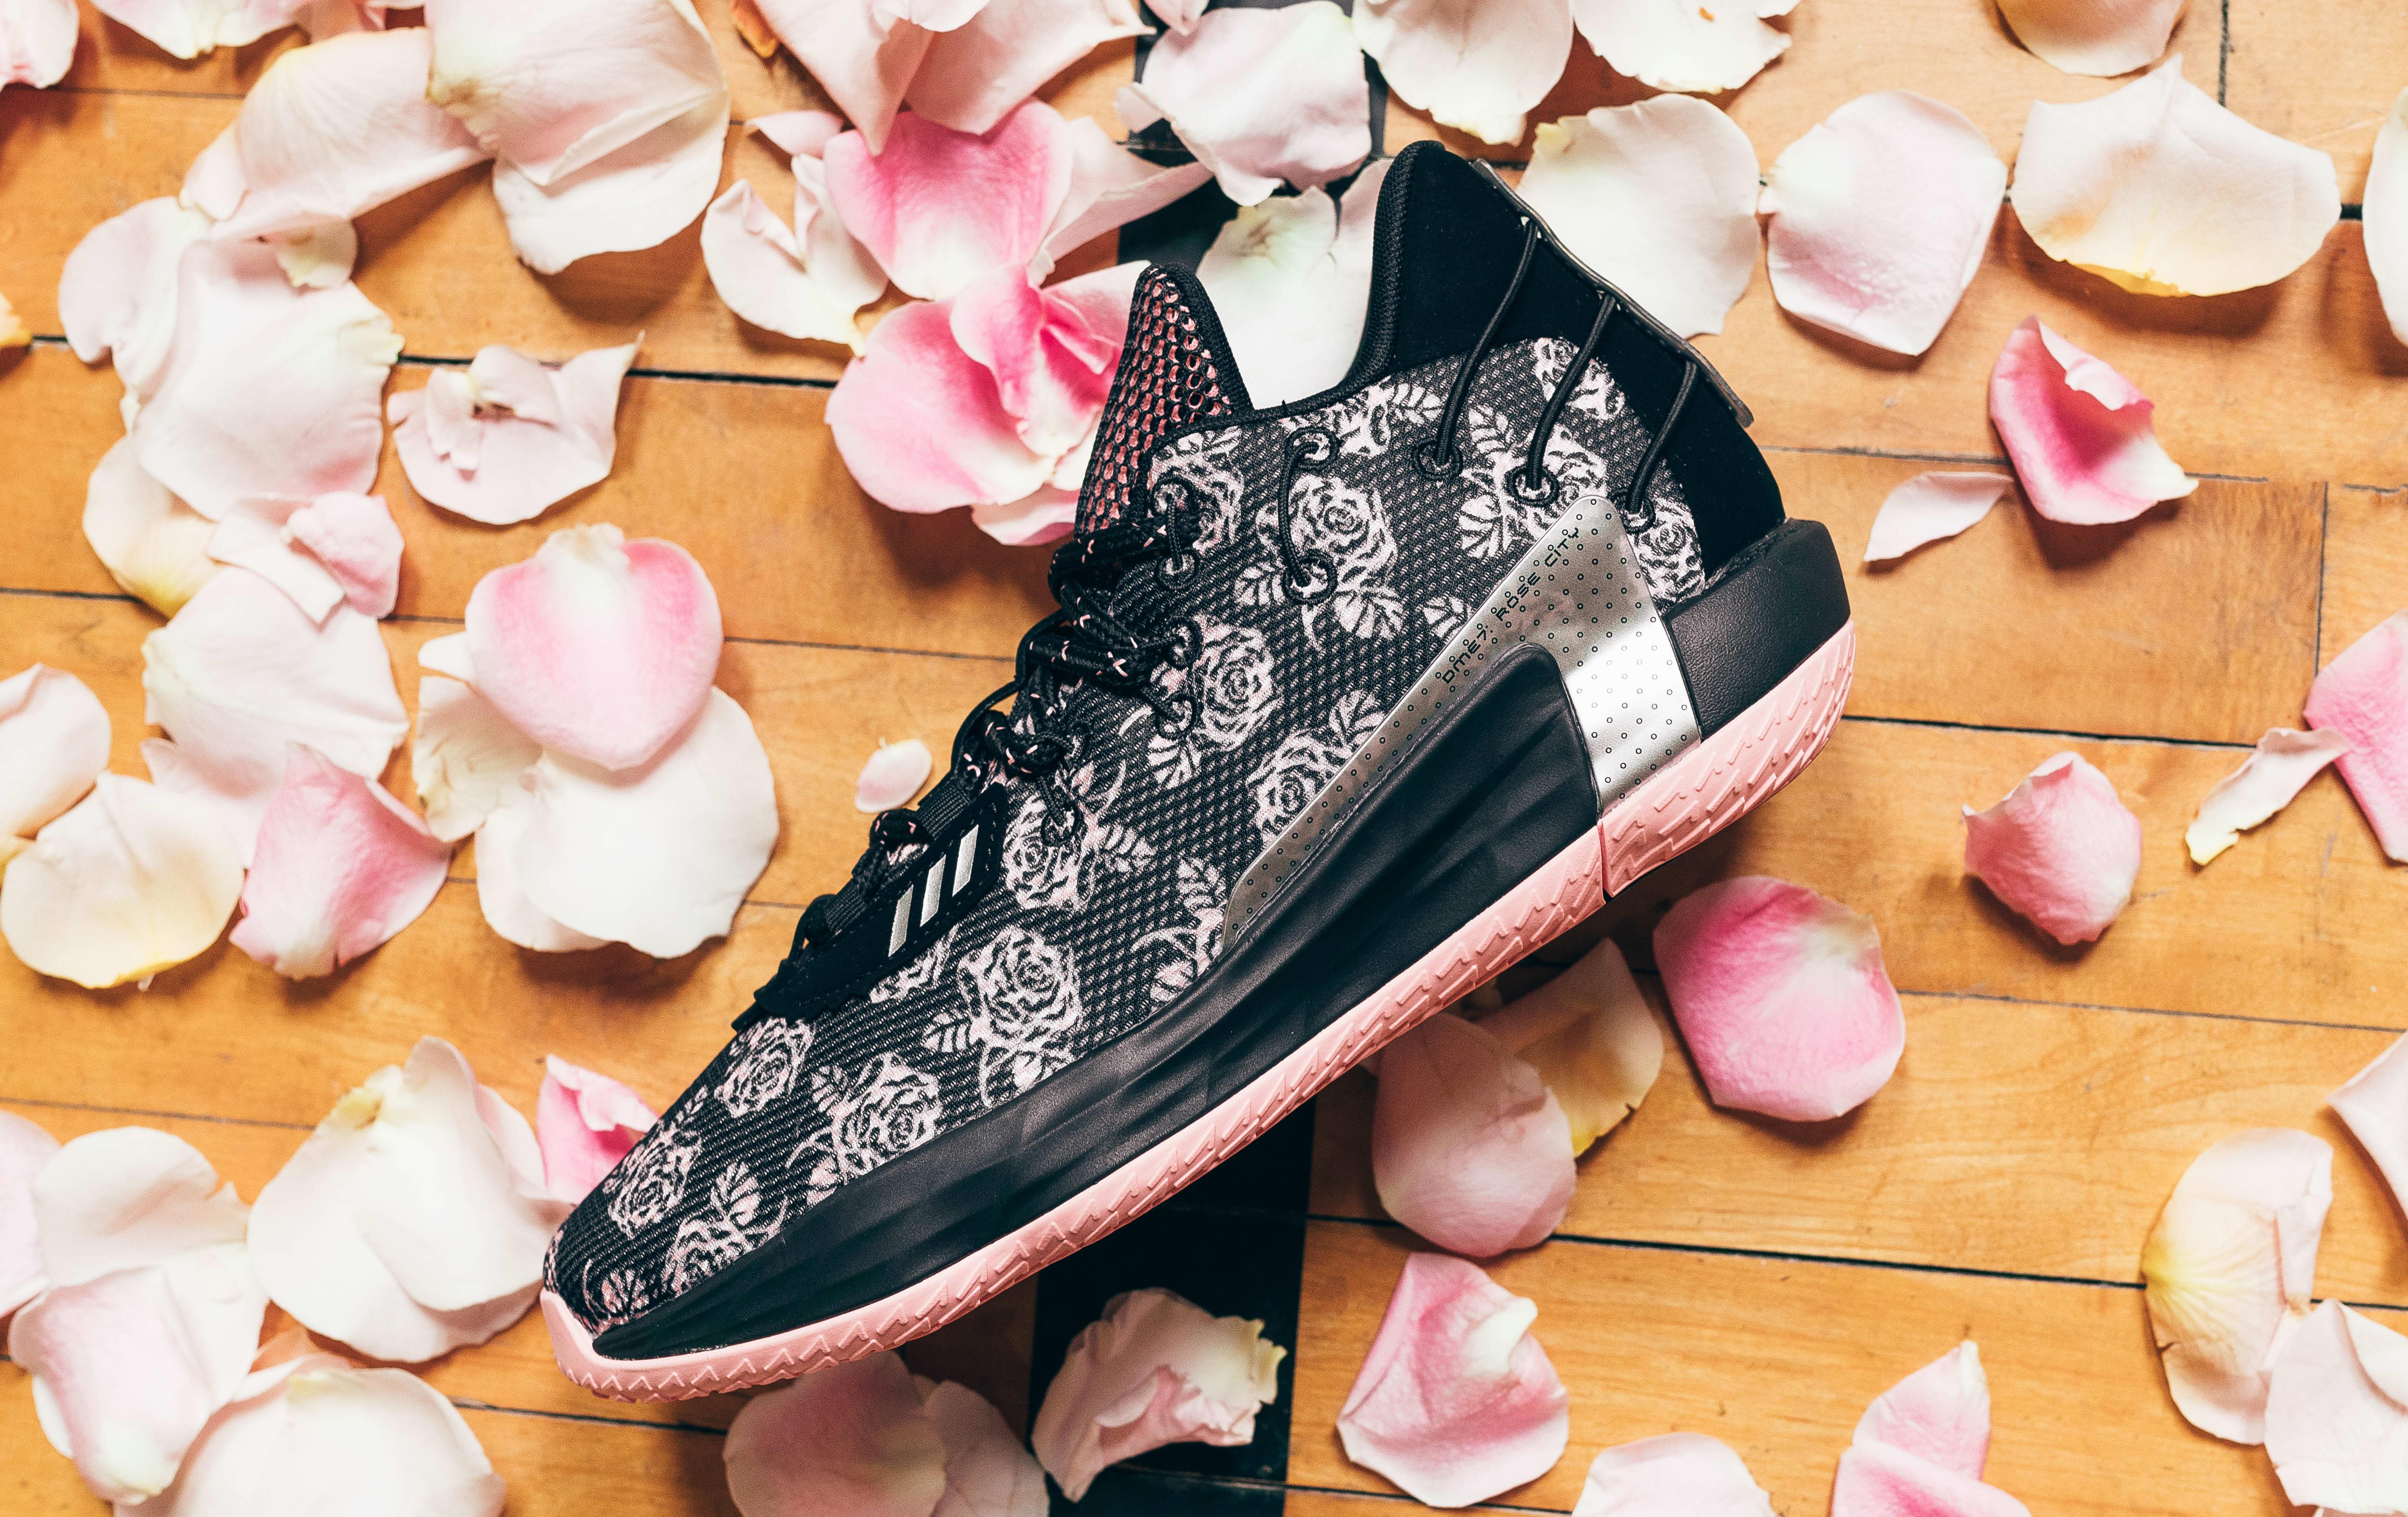 Adidas Dame 7 'Rose' Lateral